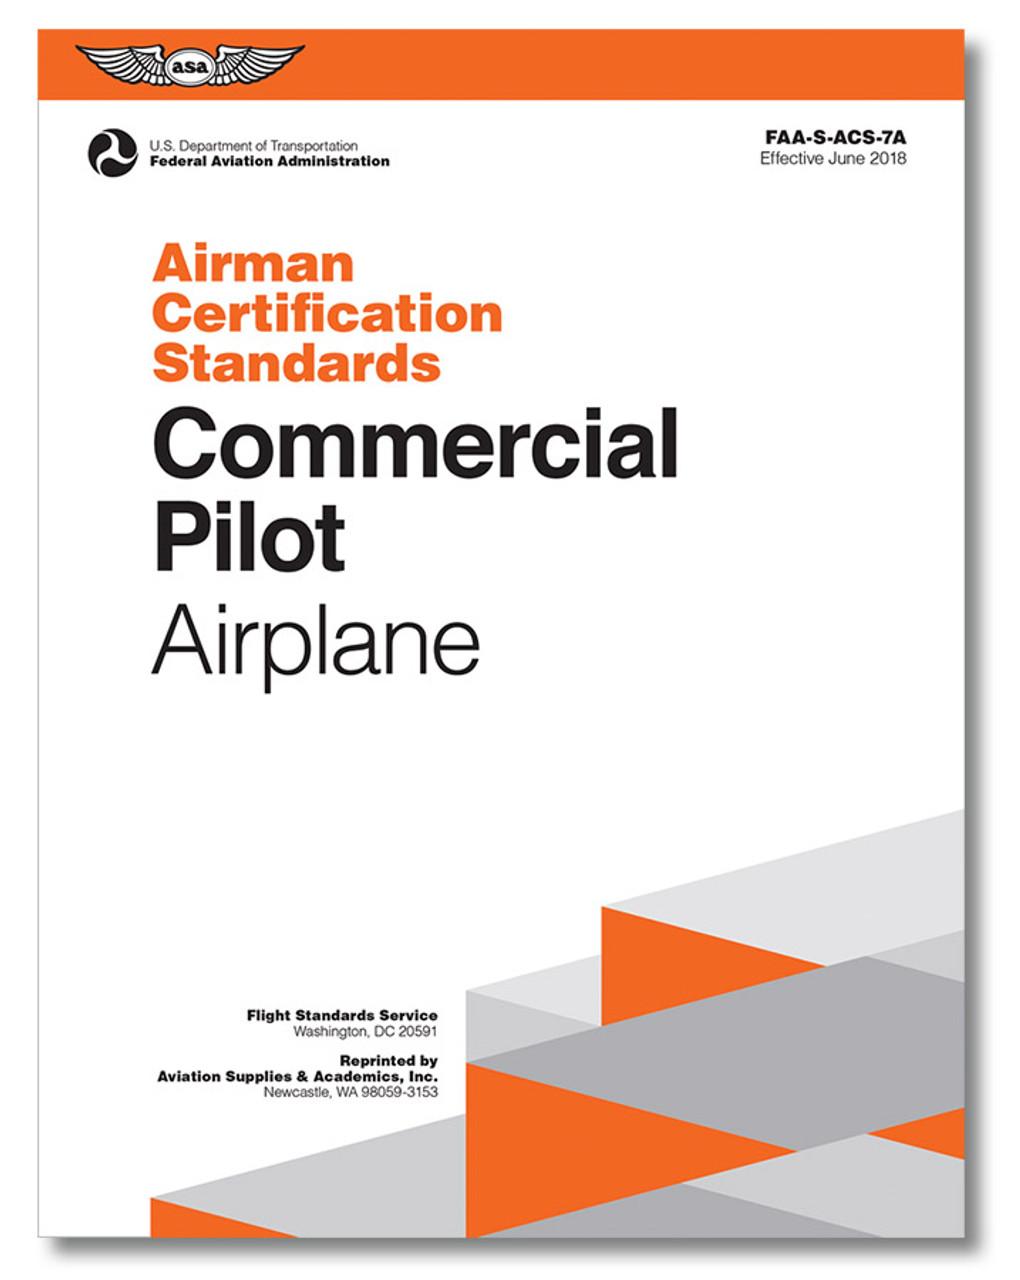 ASA Airman Certification Standards: Commercial Pilot Airplane